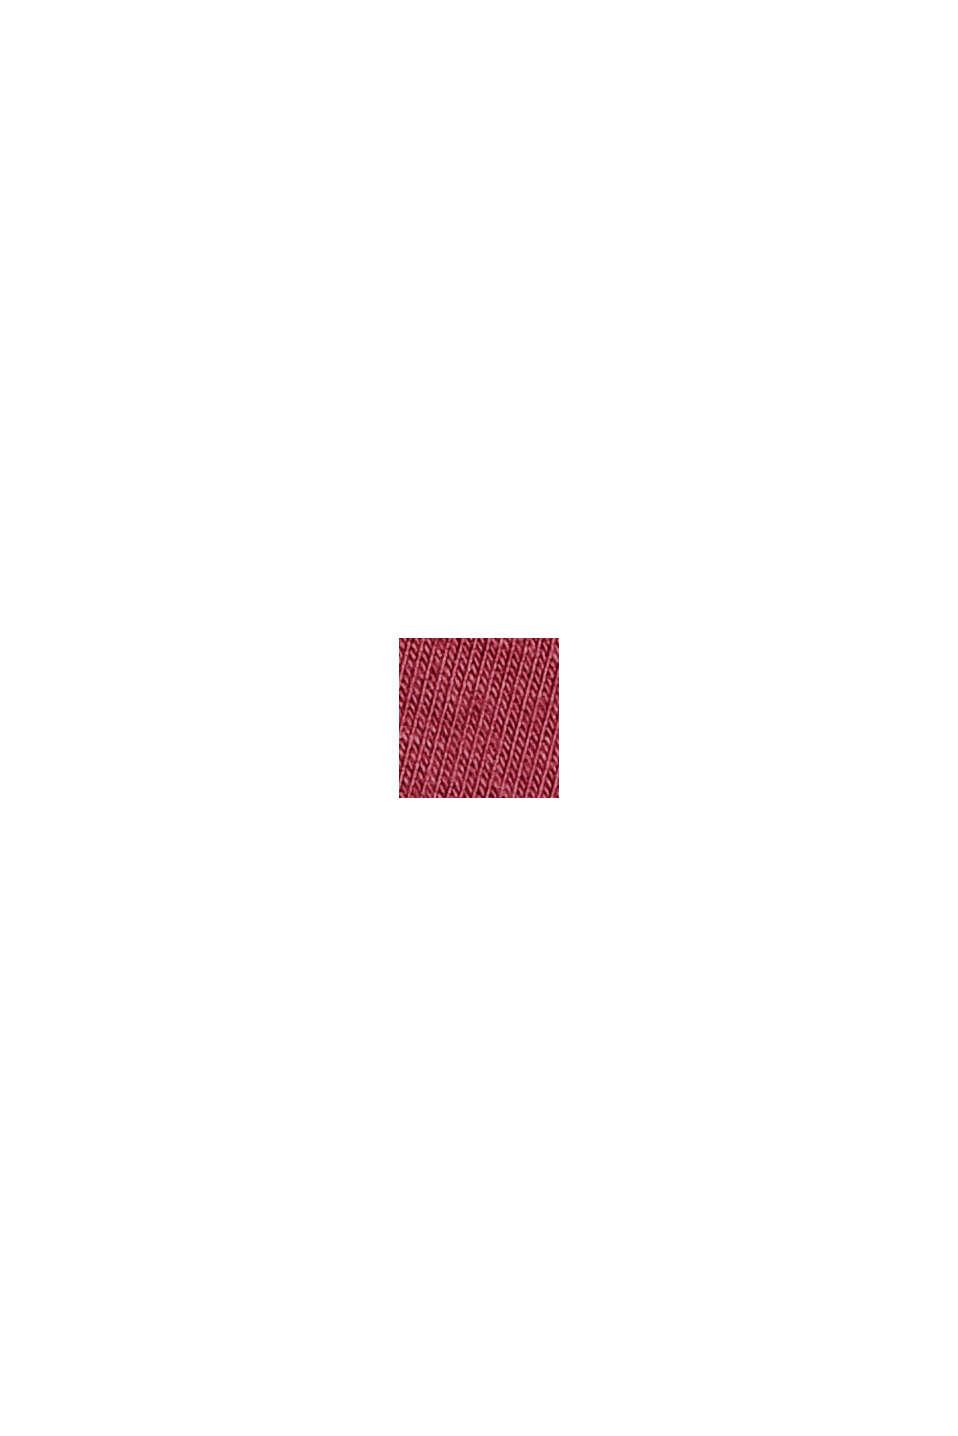 Pantaloni da pigiama con raso, LENZING™ ECOVERO™, DARK RED, swatch